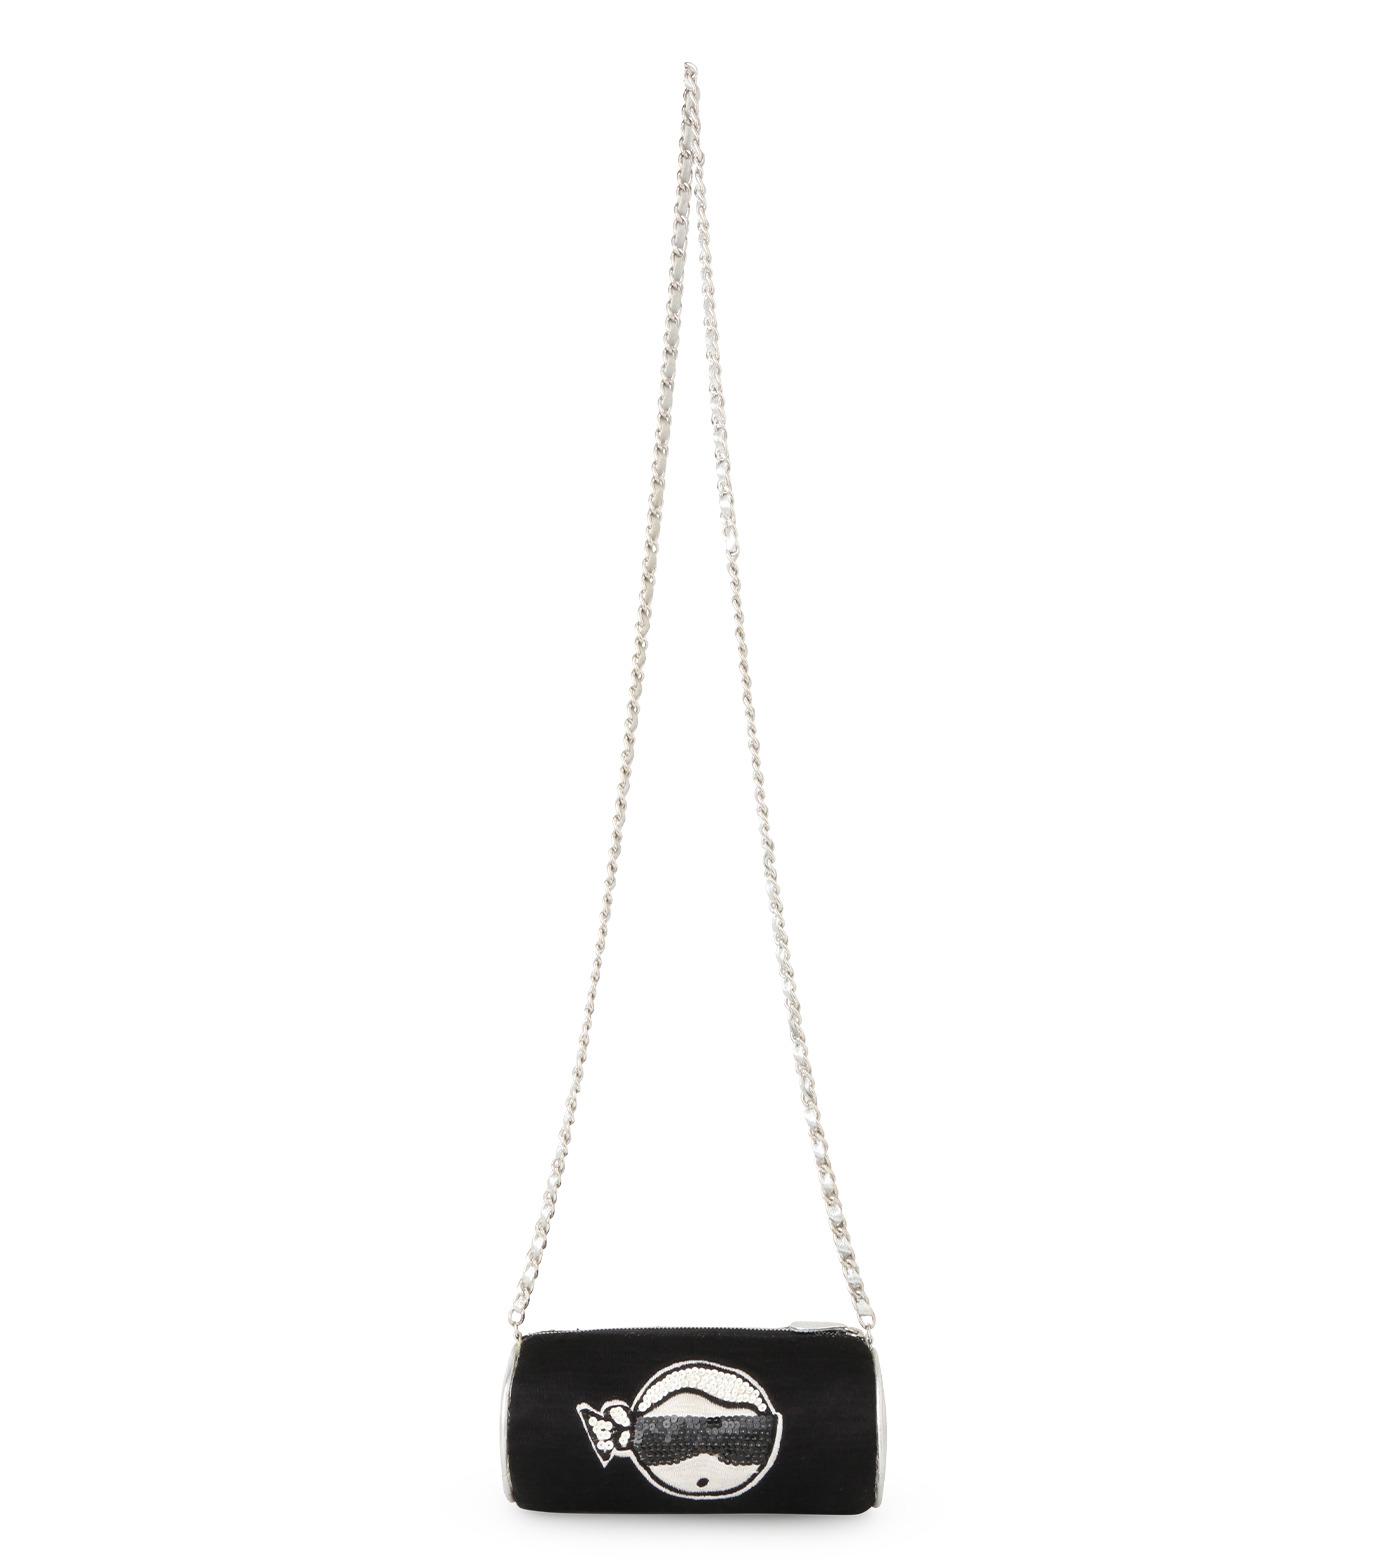 MUA MUA DOLLS()のSoda Bag Karl Zero-BLACK(ショルダーバッグ/shoulder bag)-Karl-Zero-13 拡大詳細画像3